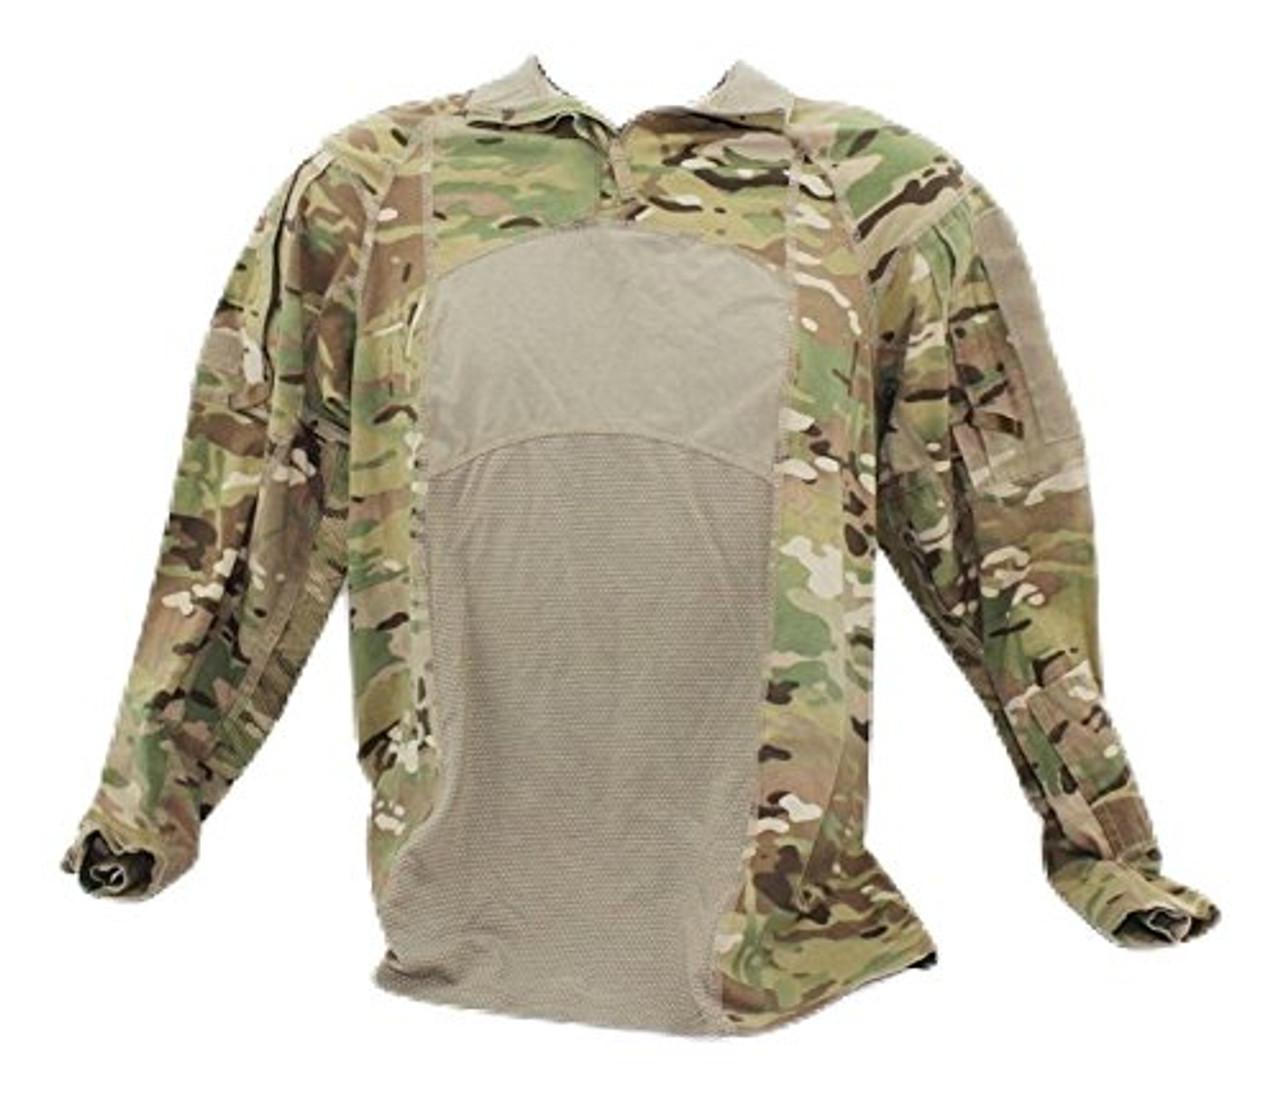 ARMY OCP MULTICAM ADVANCED COMBAT SHIRT TYPE II 1/4 ZIPPER